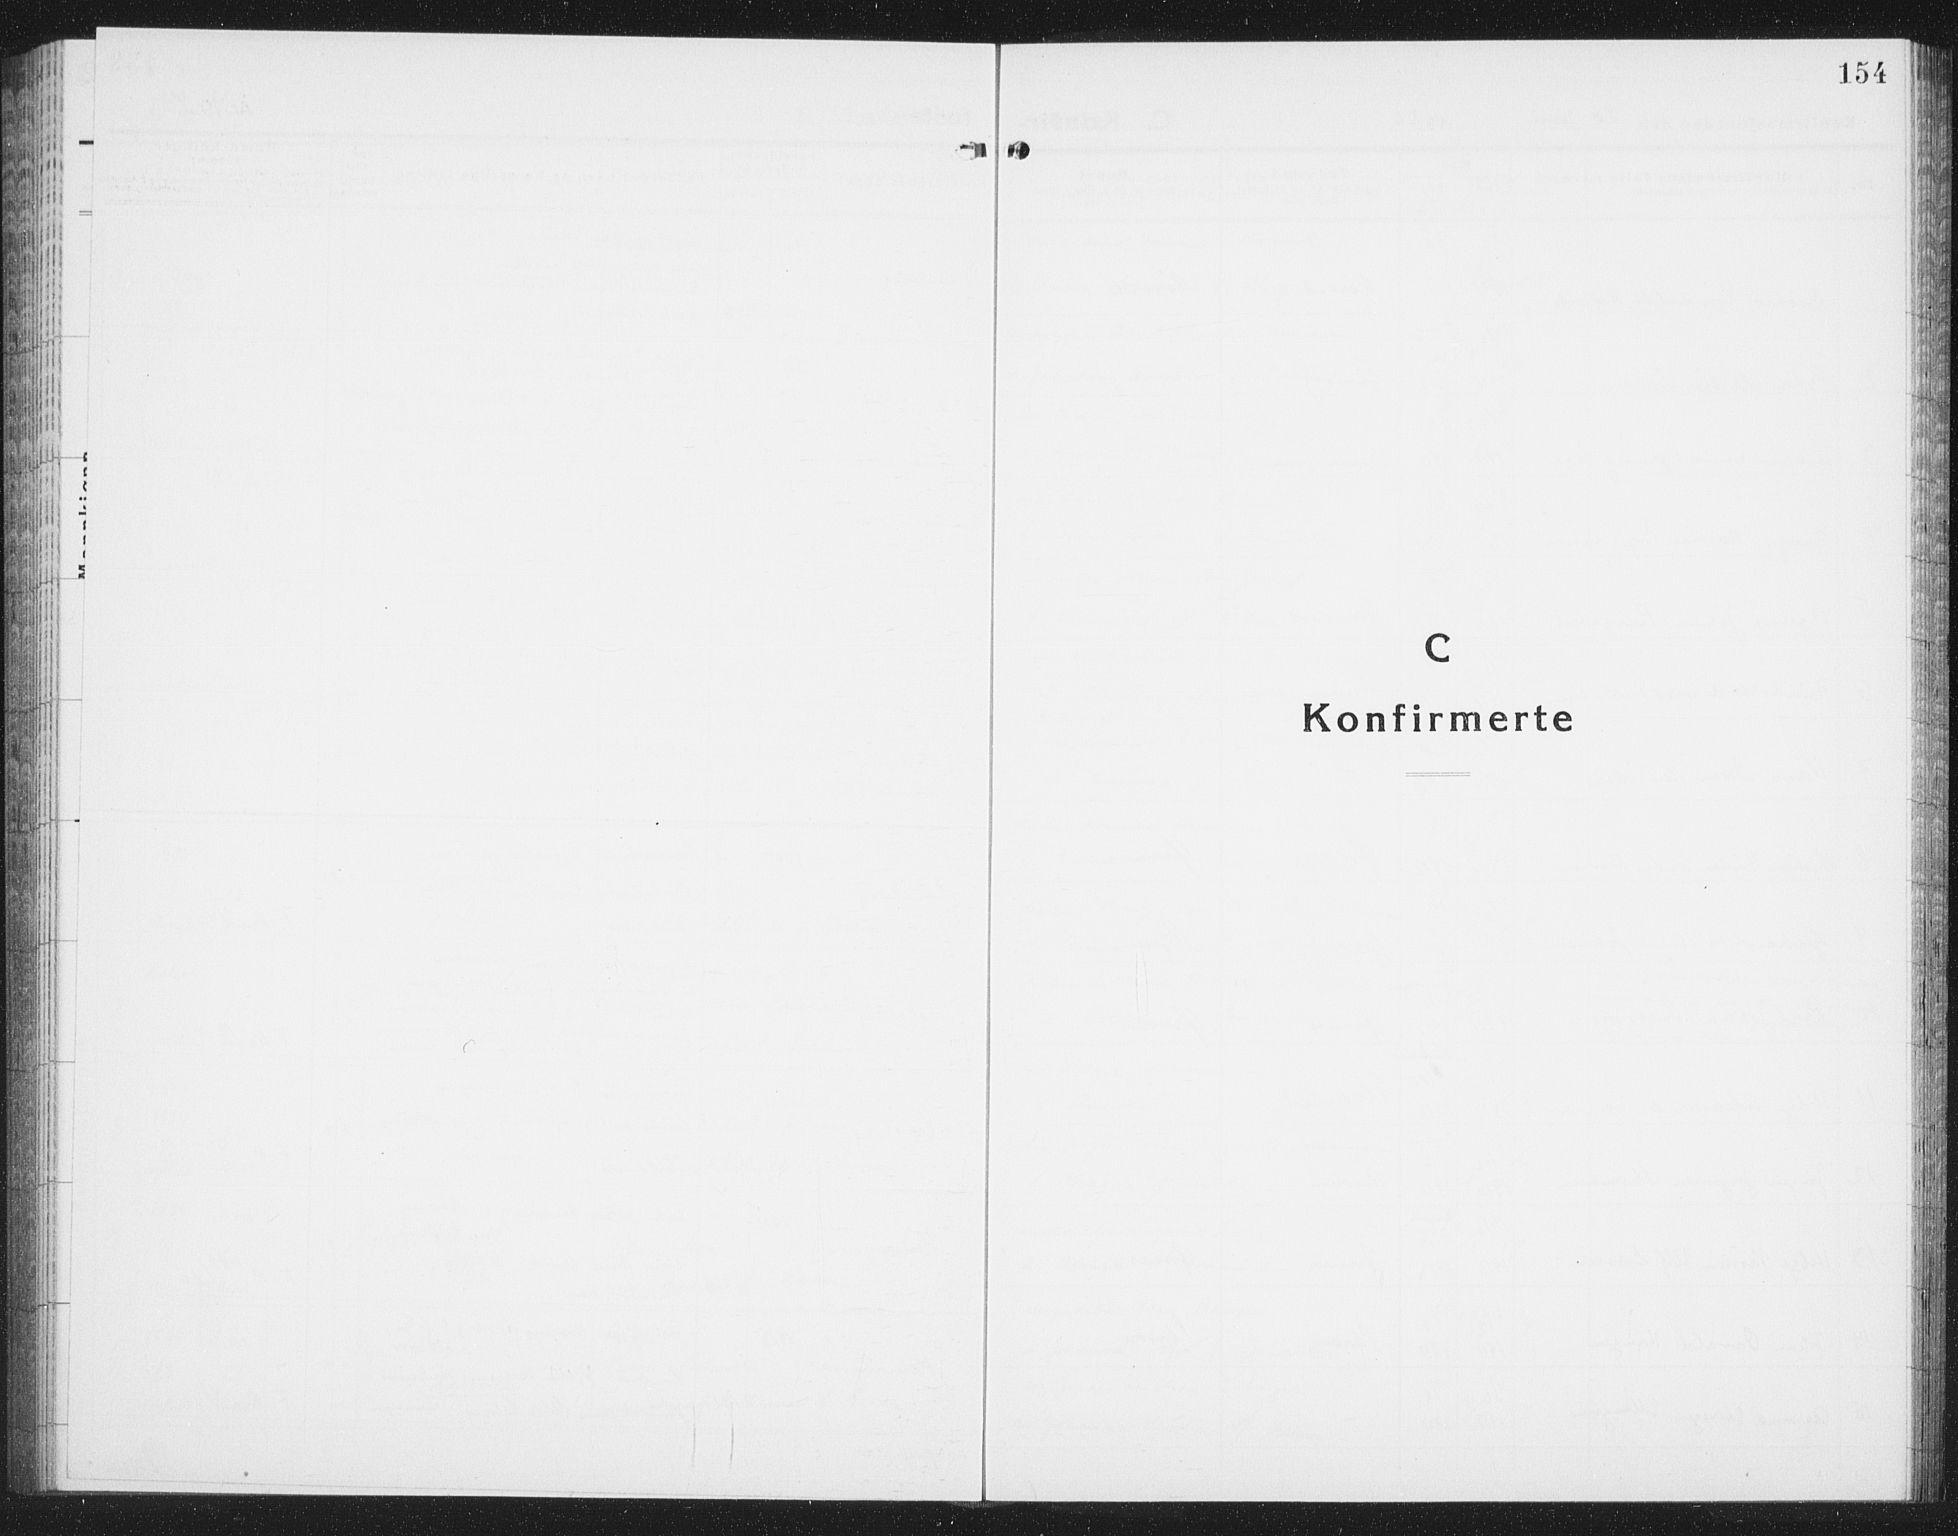 SAT, Ministerialprotokoller, klokkerbøker og fødselsregistre - Nordland, 874/L1081: Klokkerbok nr. 874C10, 1925-1941, s. 154